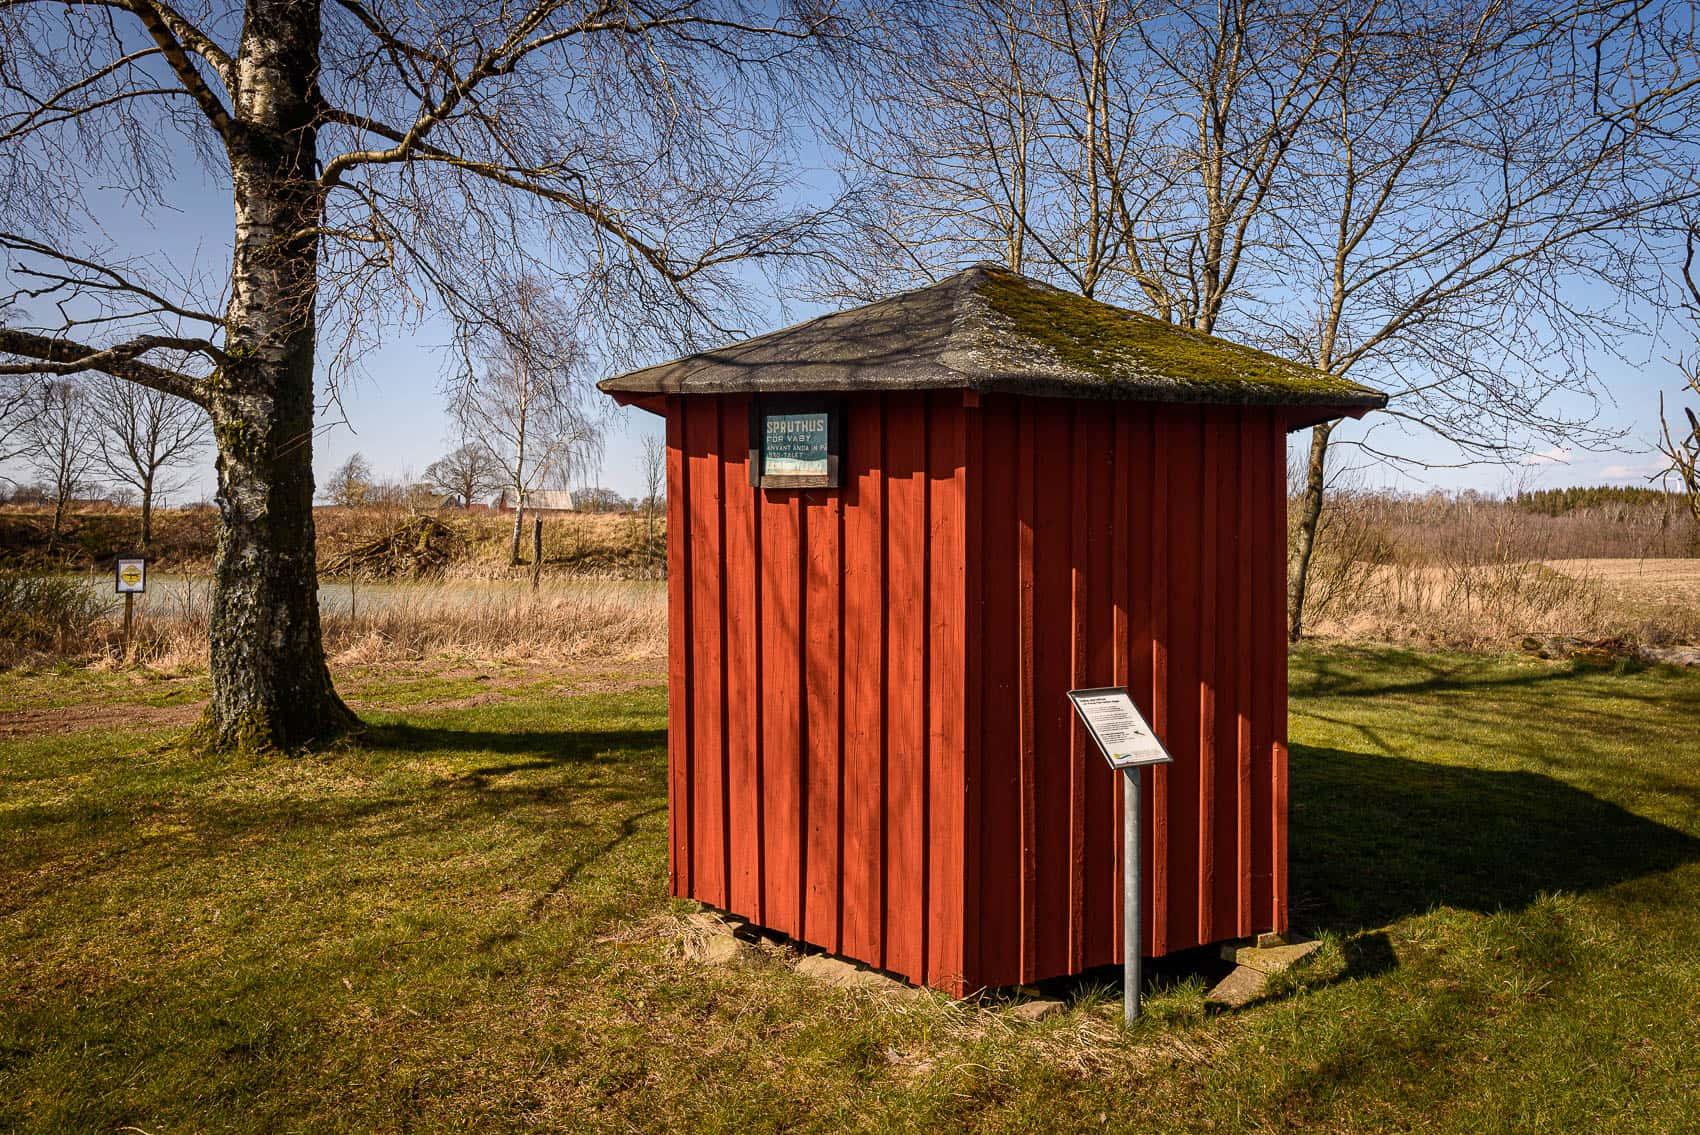 Spruthuset i Väby